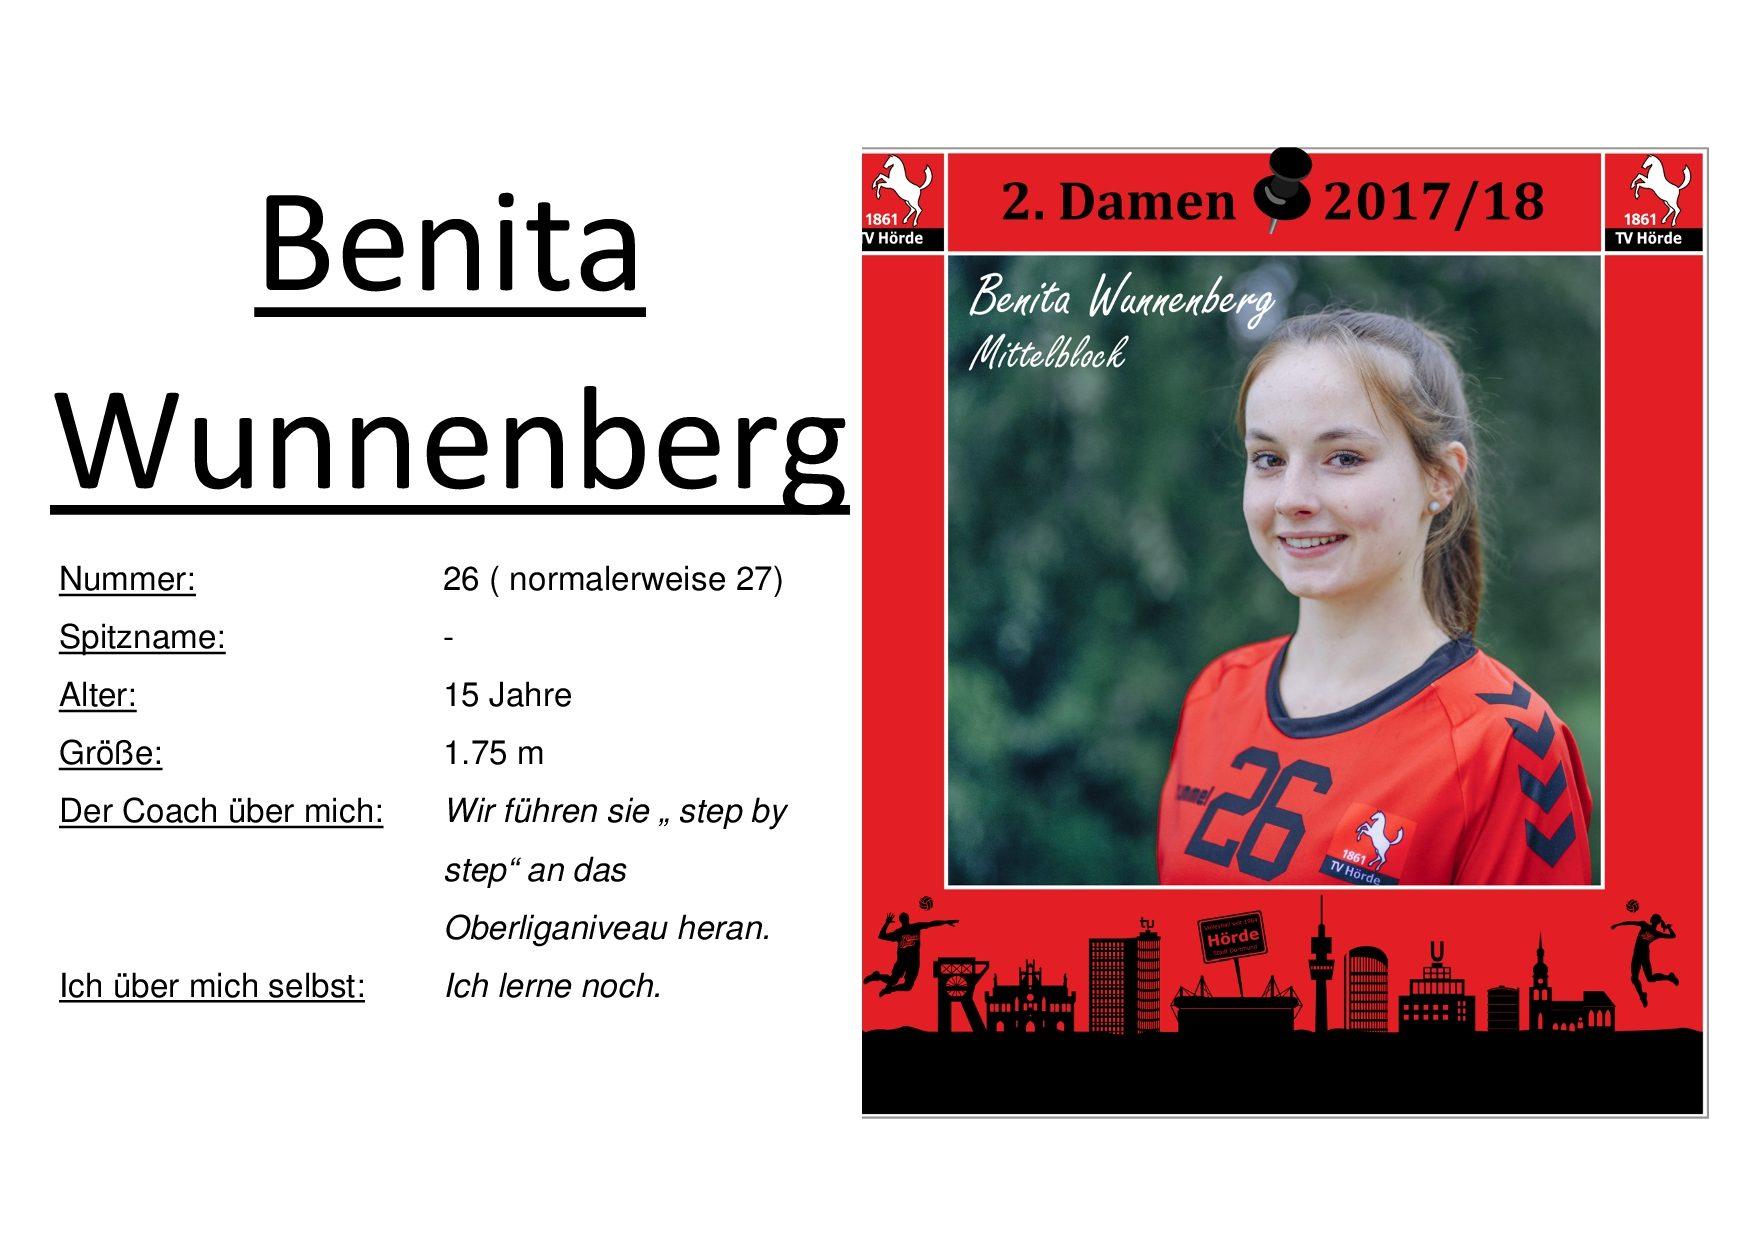 Benita Wunnenberg